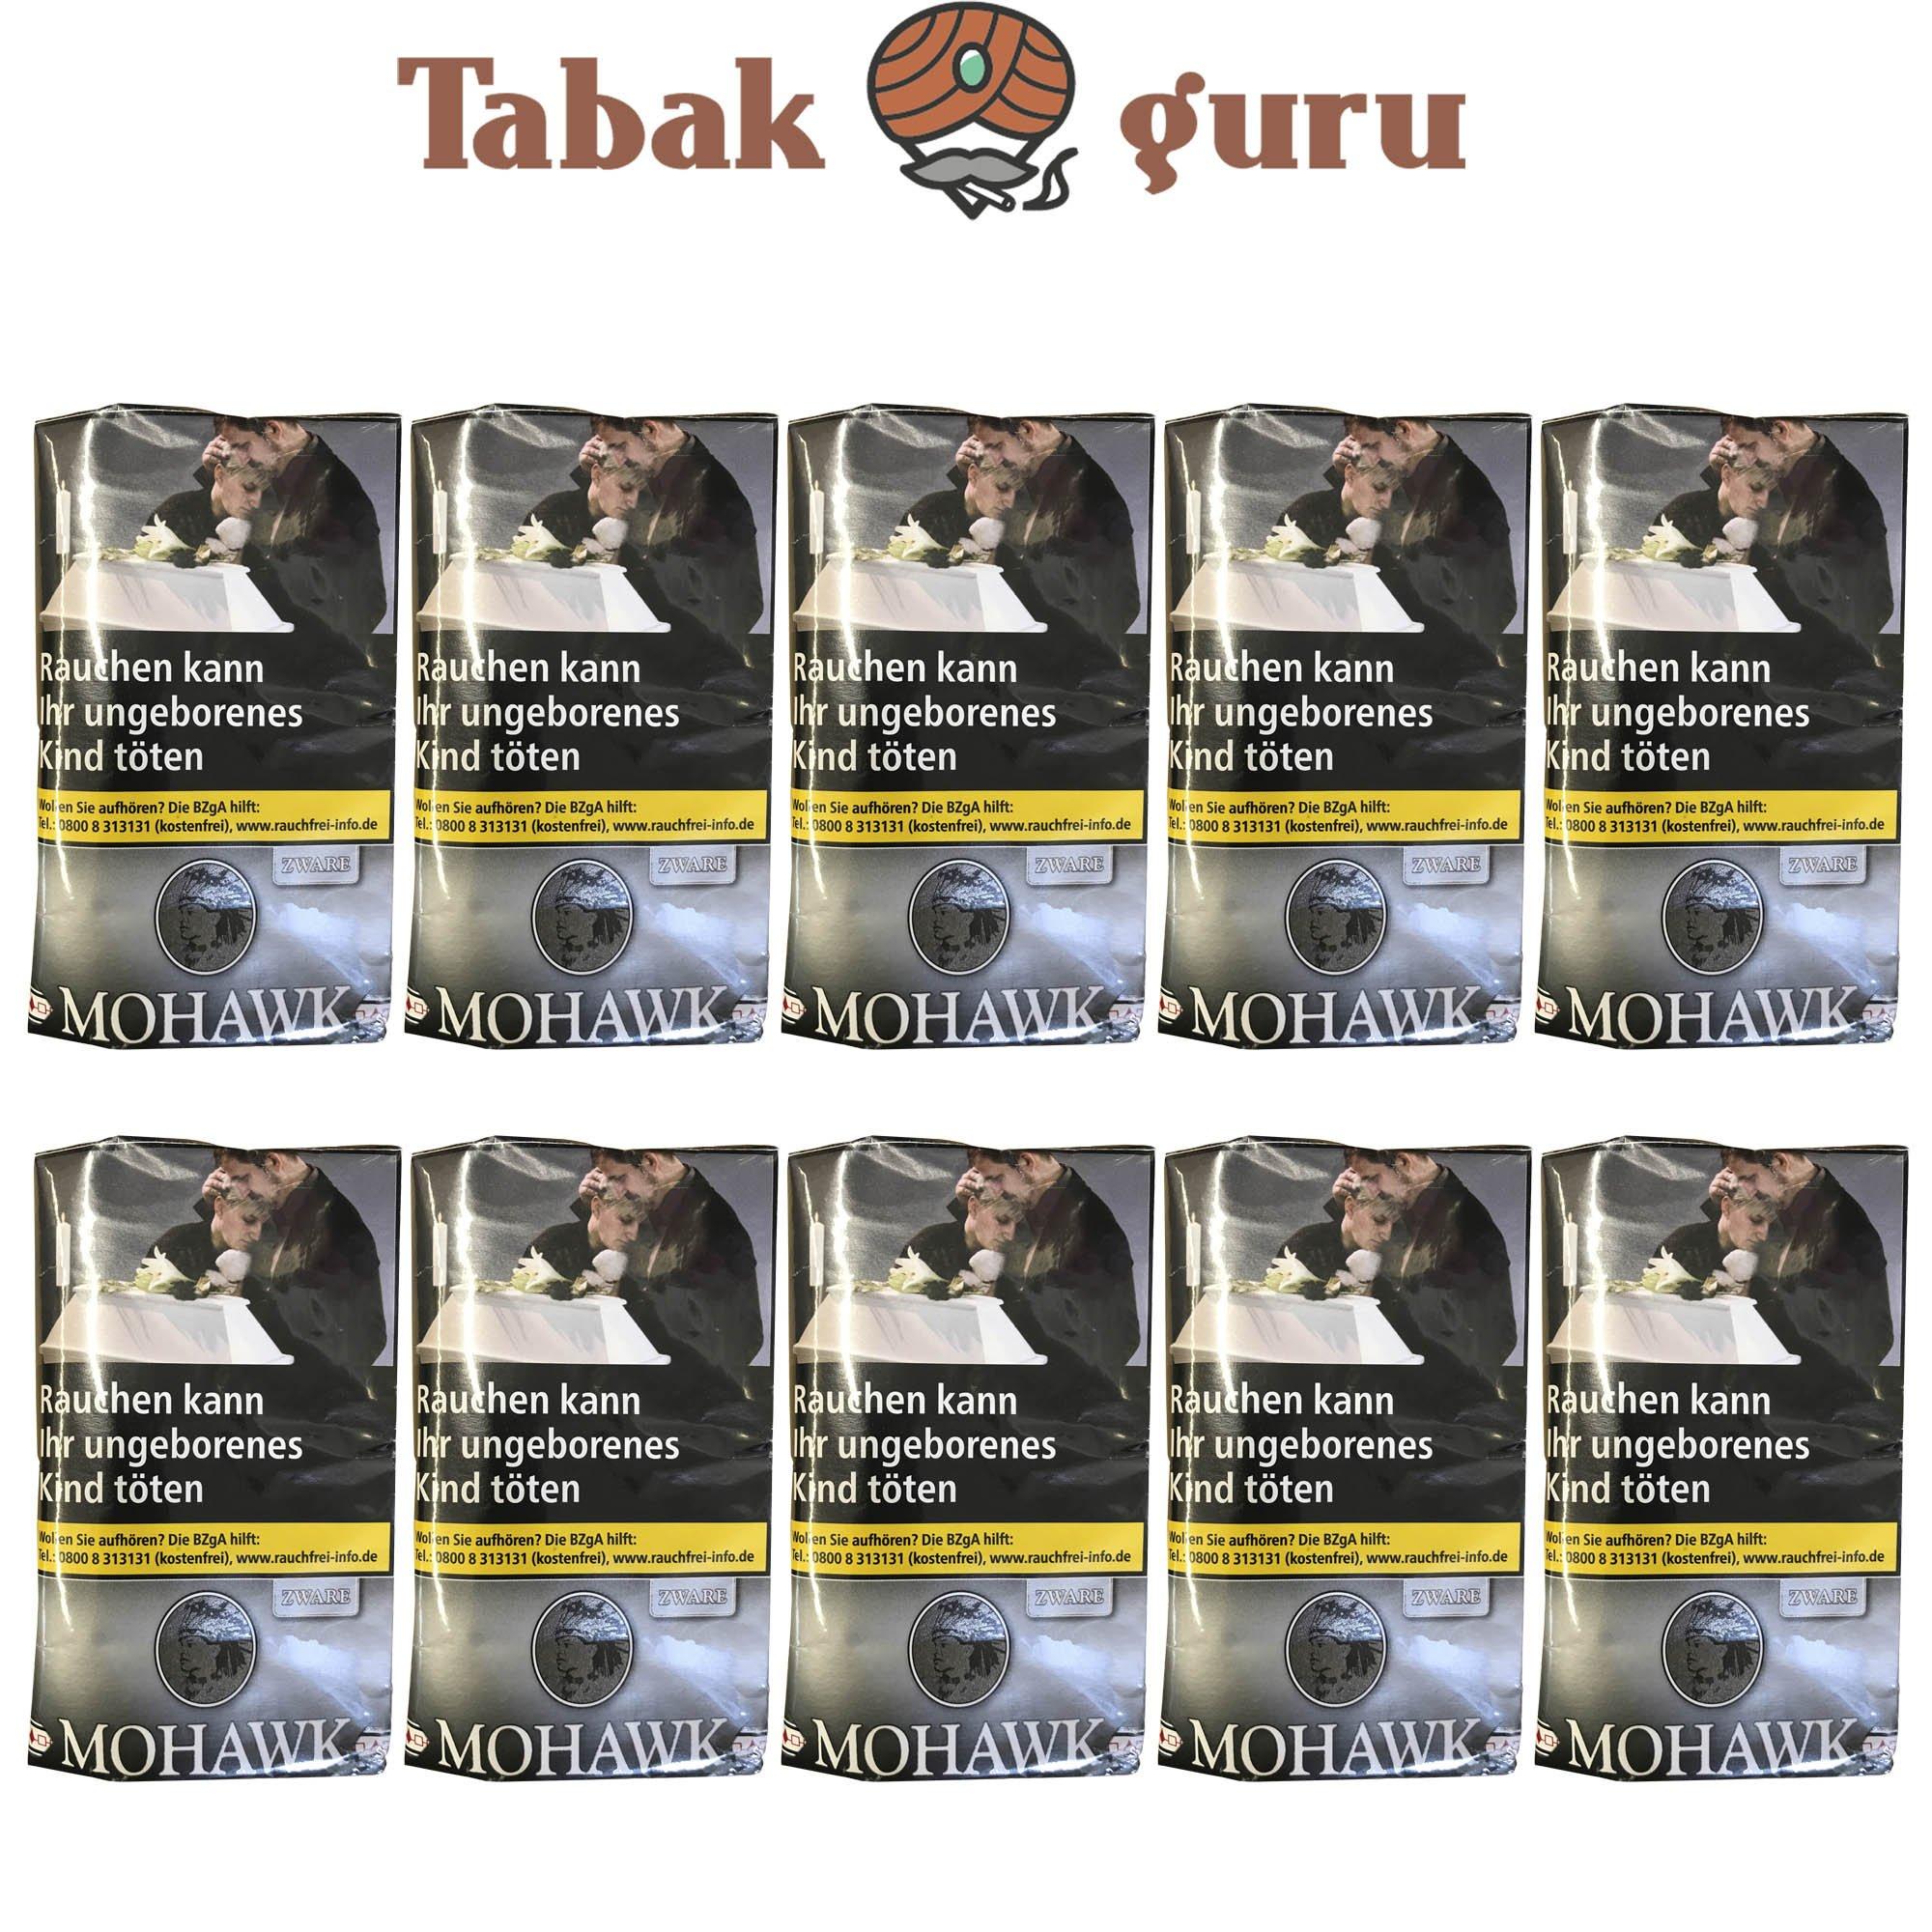 10 x Mohawk Zware 30g Drehtabak Zigarettentabak